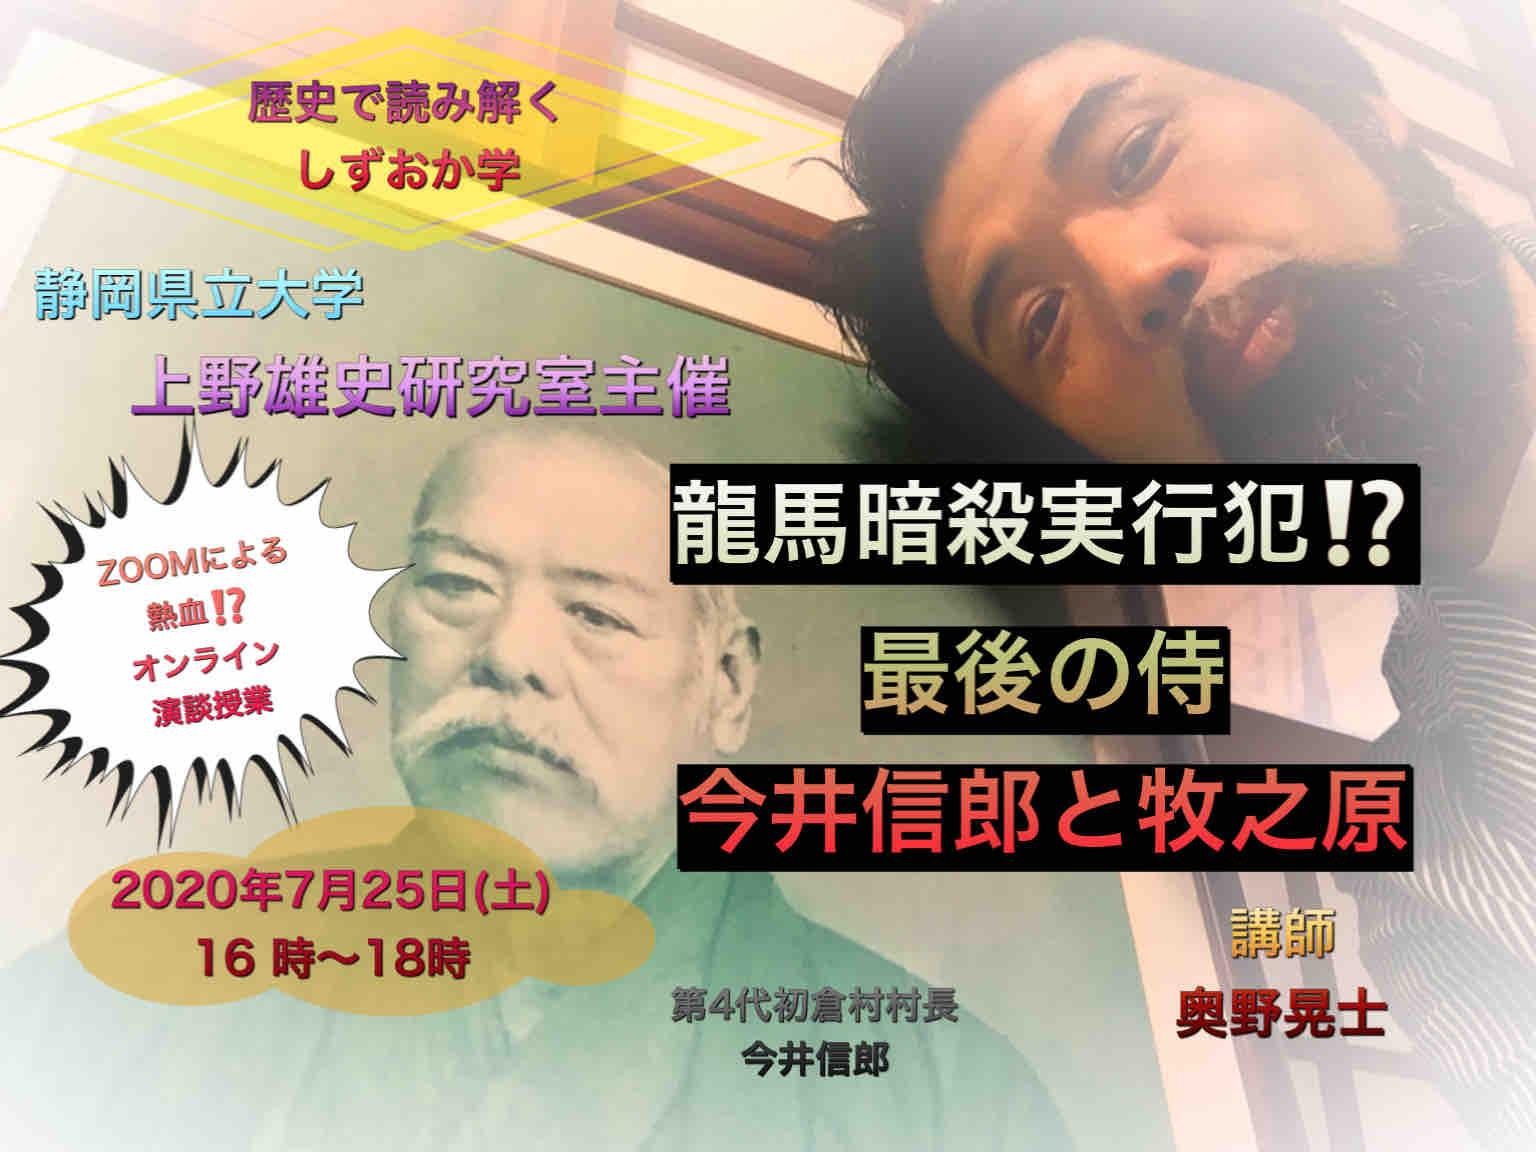 fc2blog_2020072308332811f.jpg